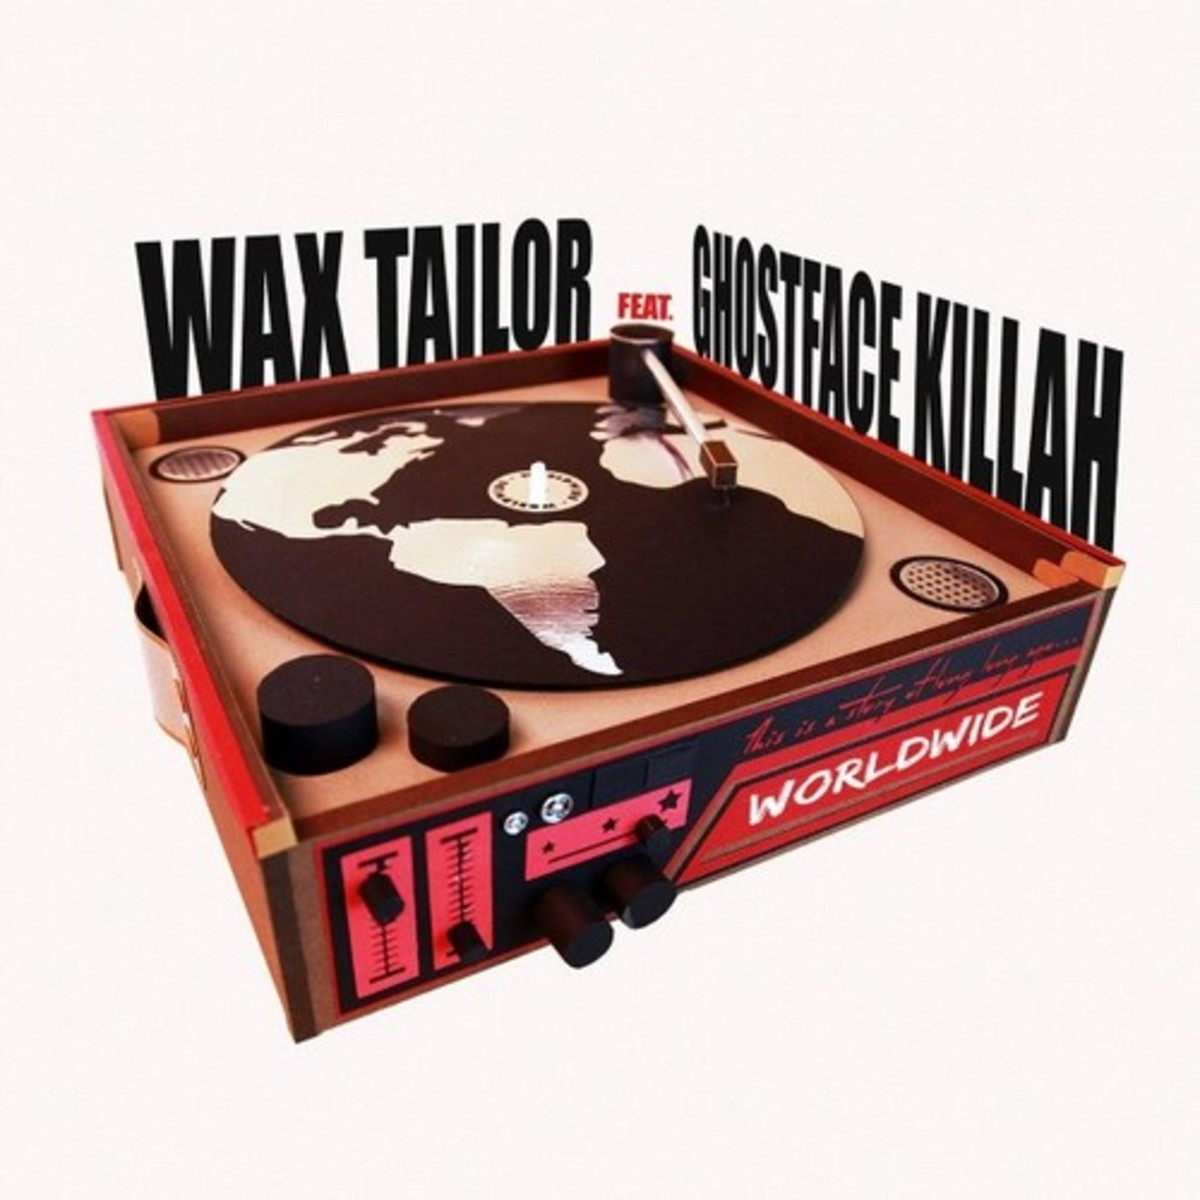 wax-tailor-worldwide.jpg